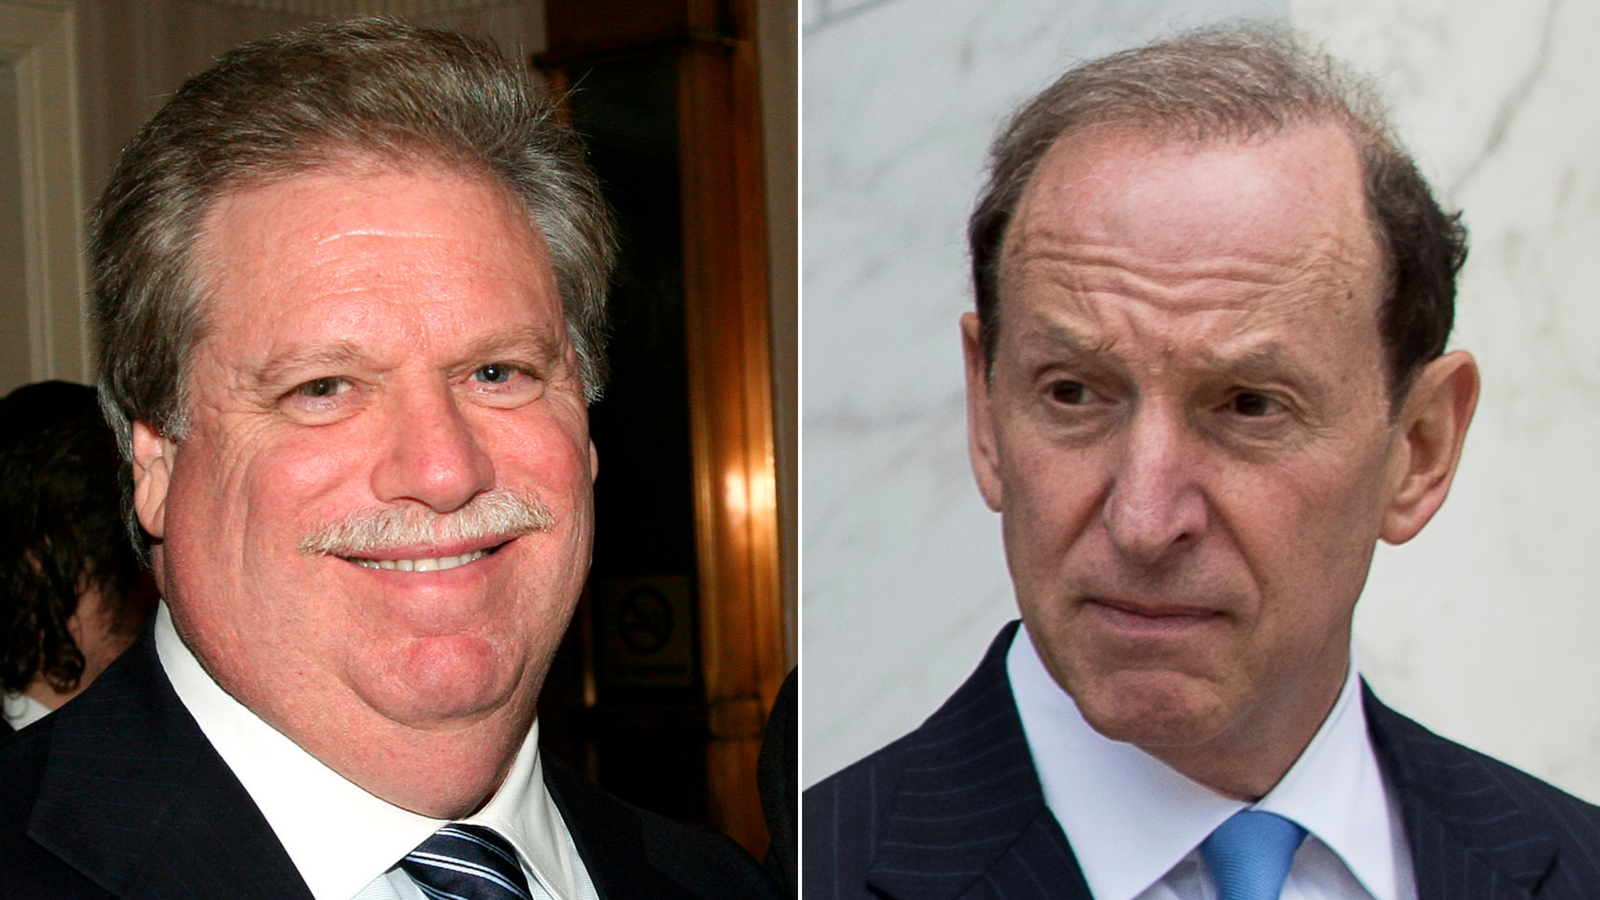 Presidential pardon investigation involves Kushner lawyer and GOP lobbyist, sources say